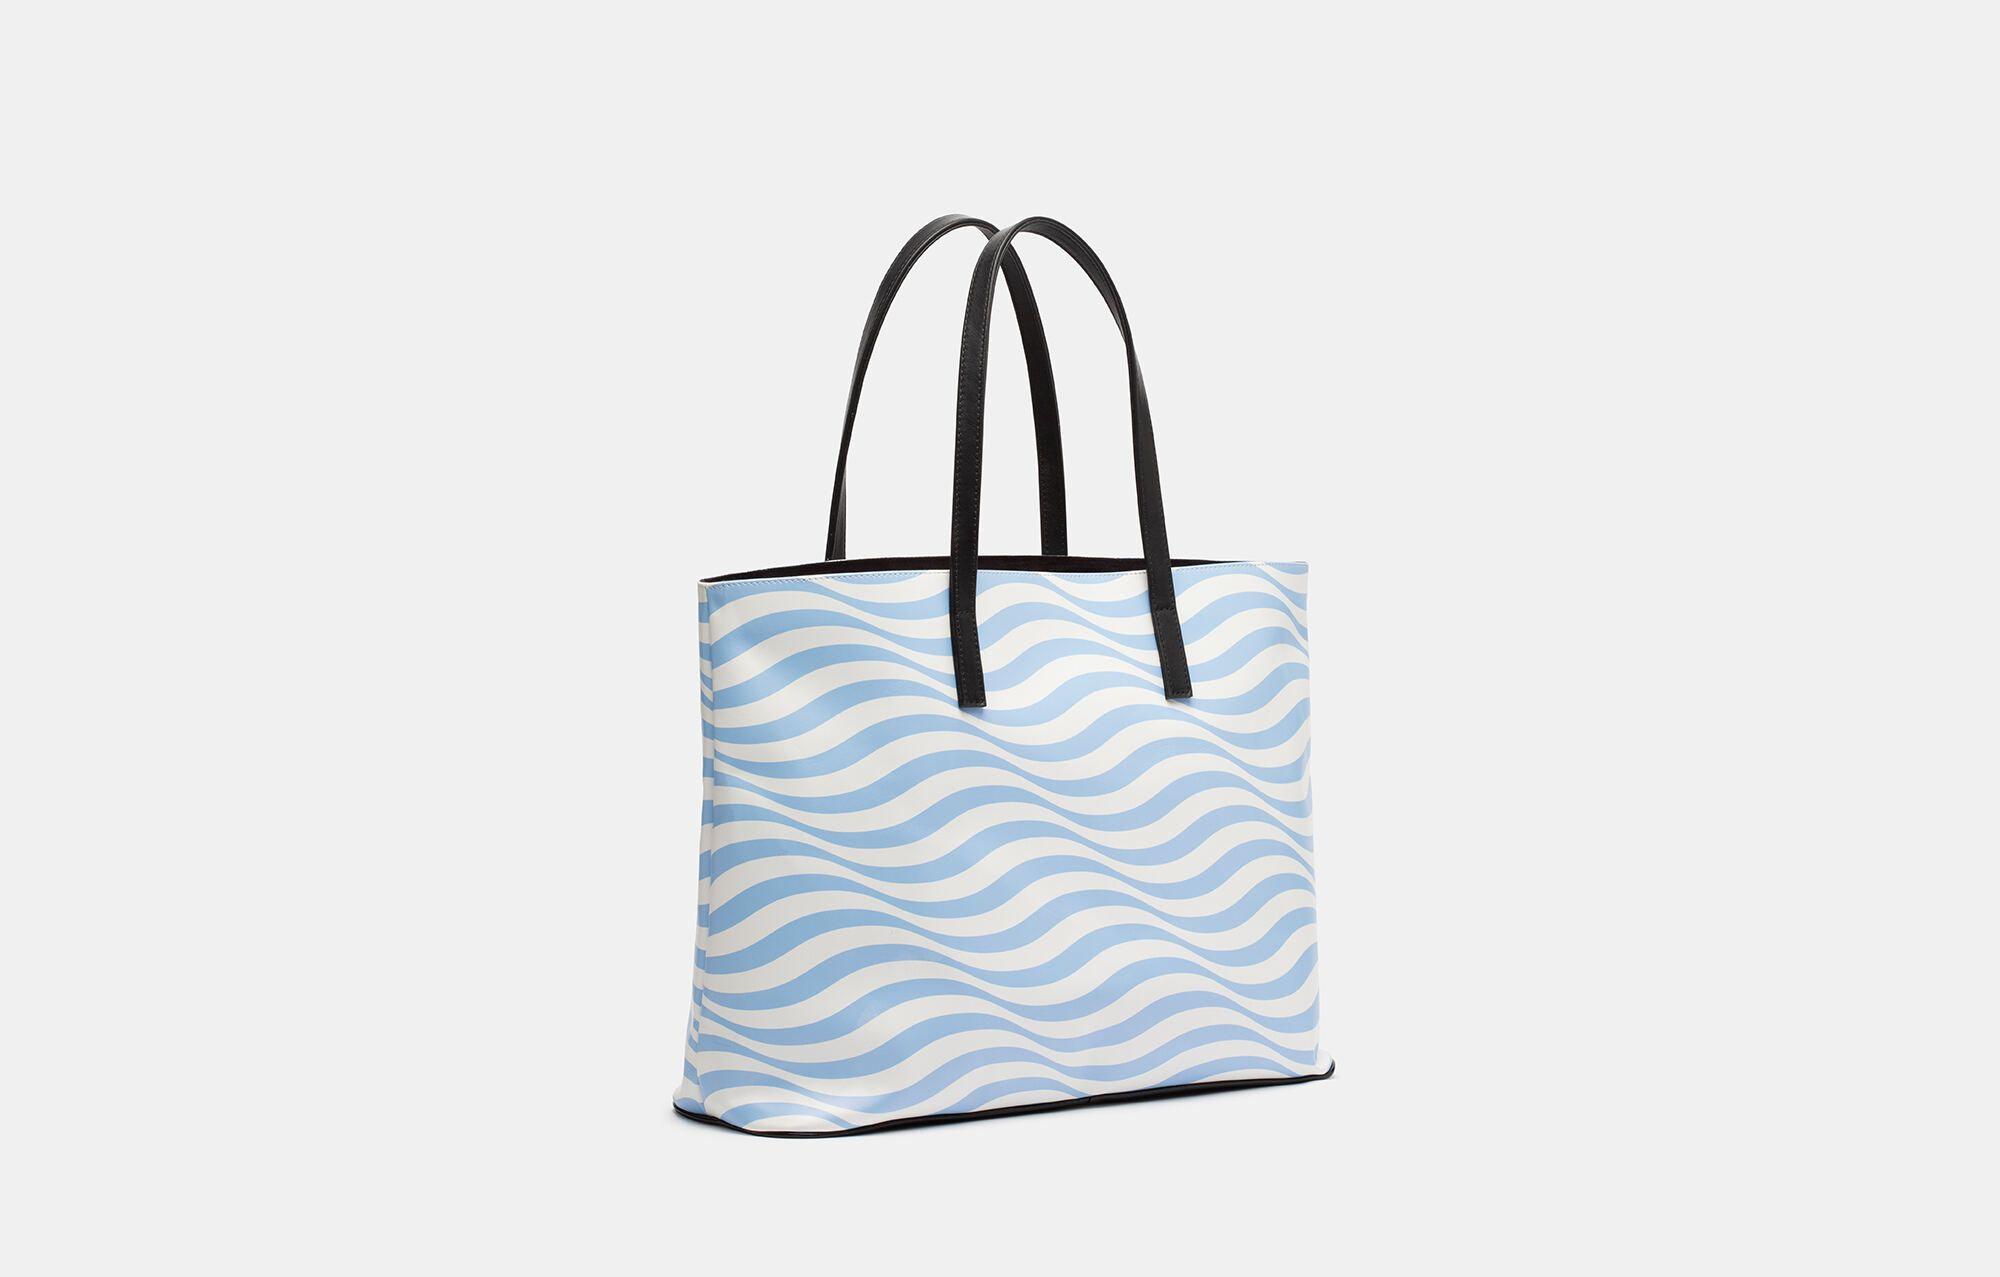 väskor med eget tryck